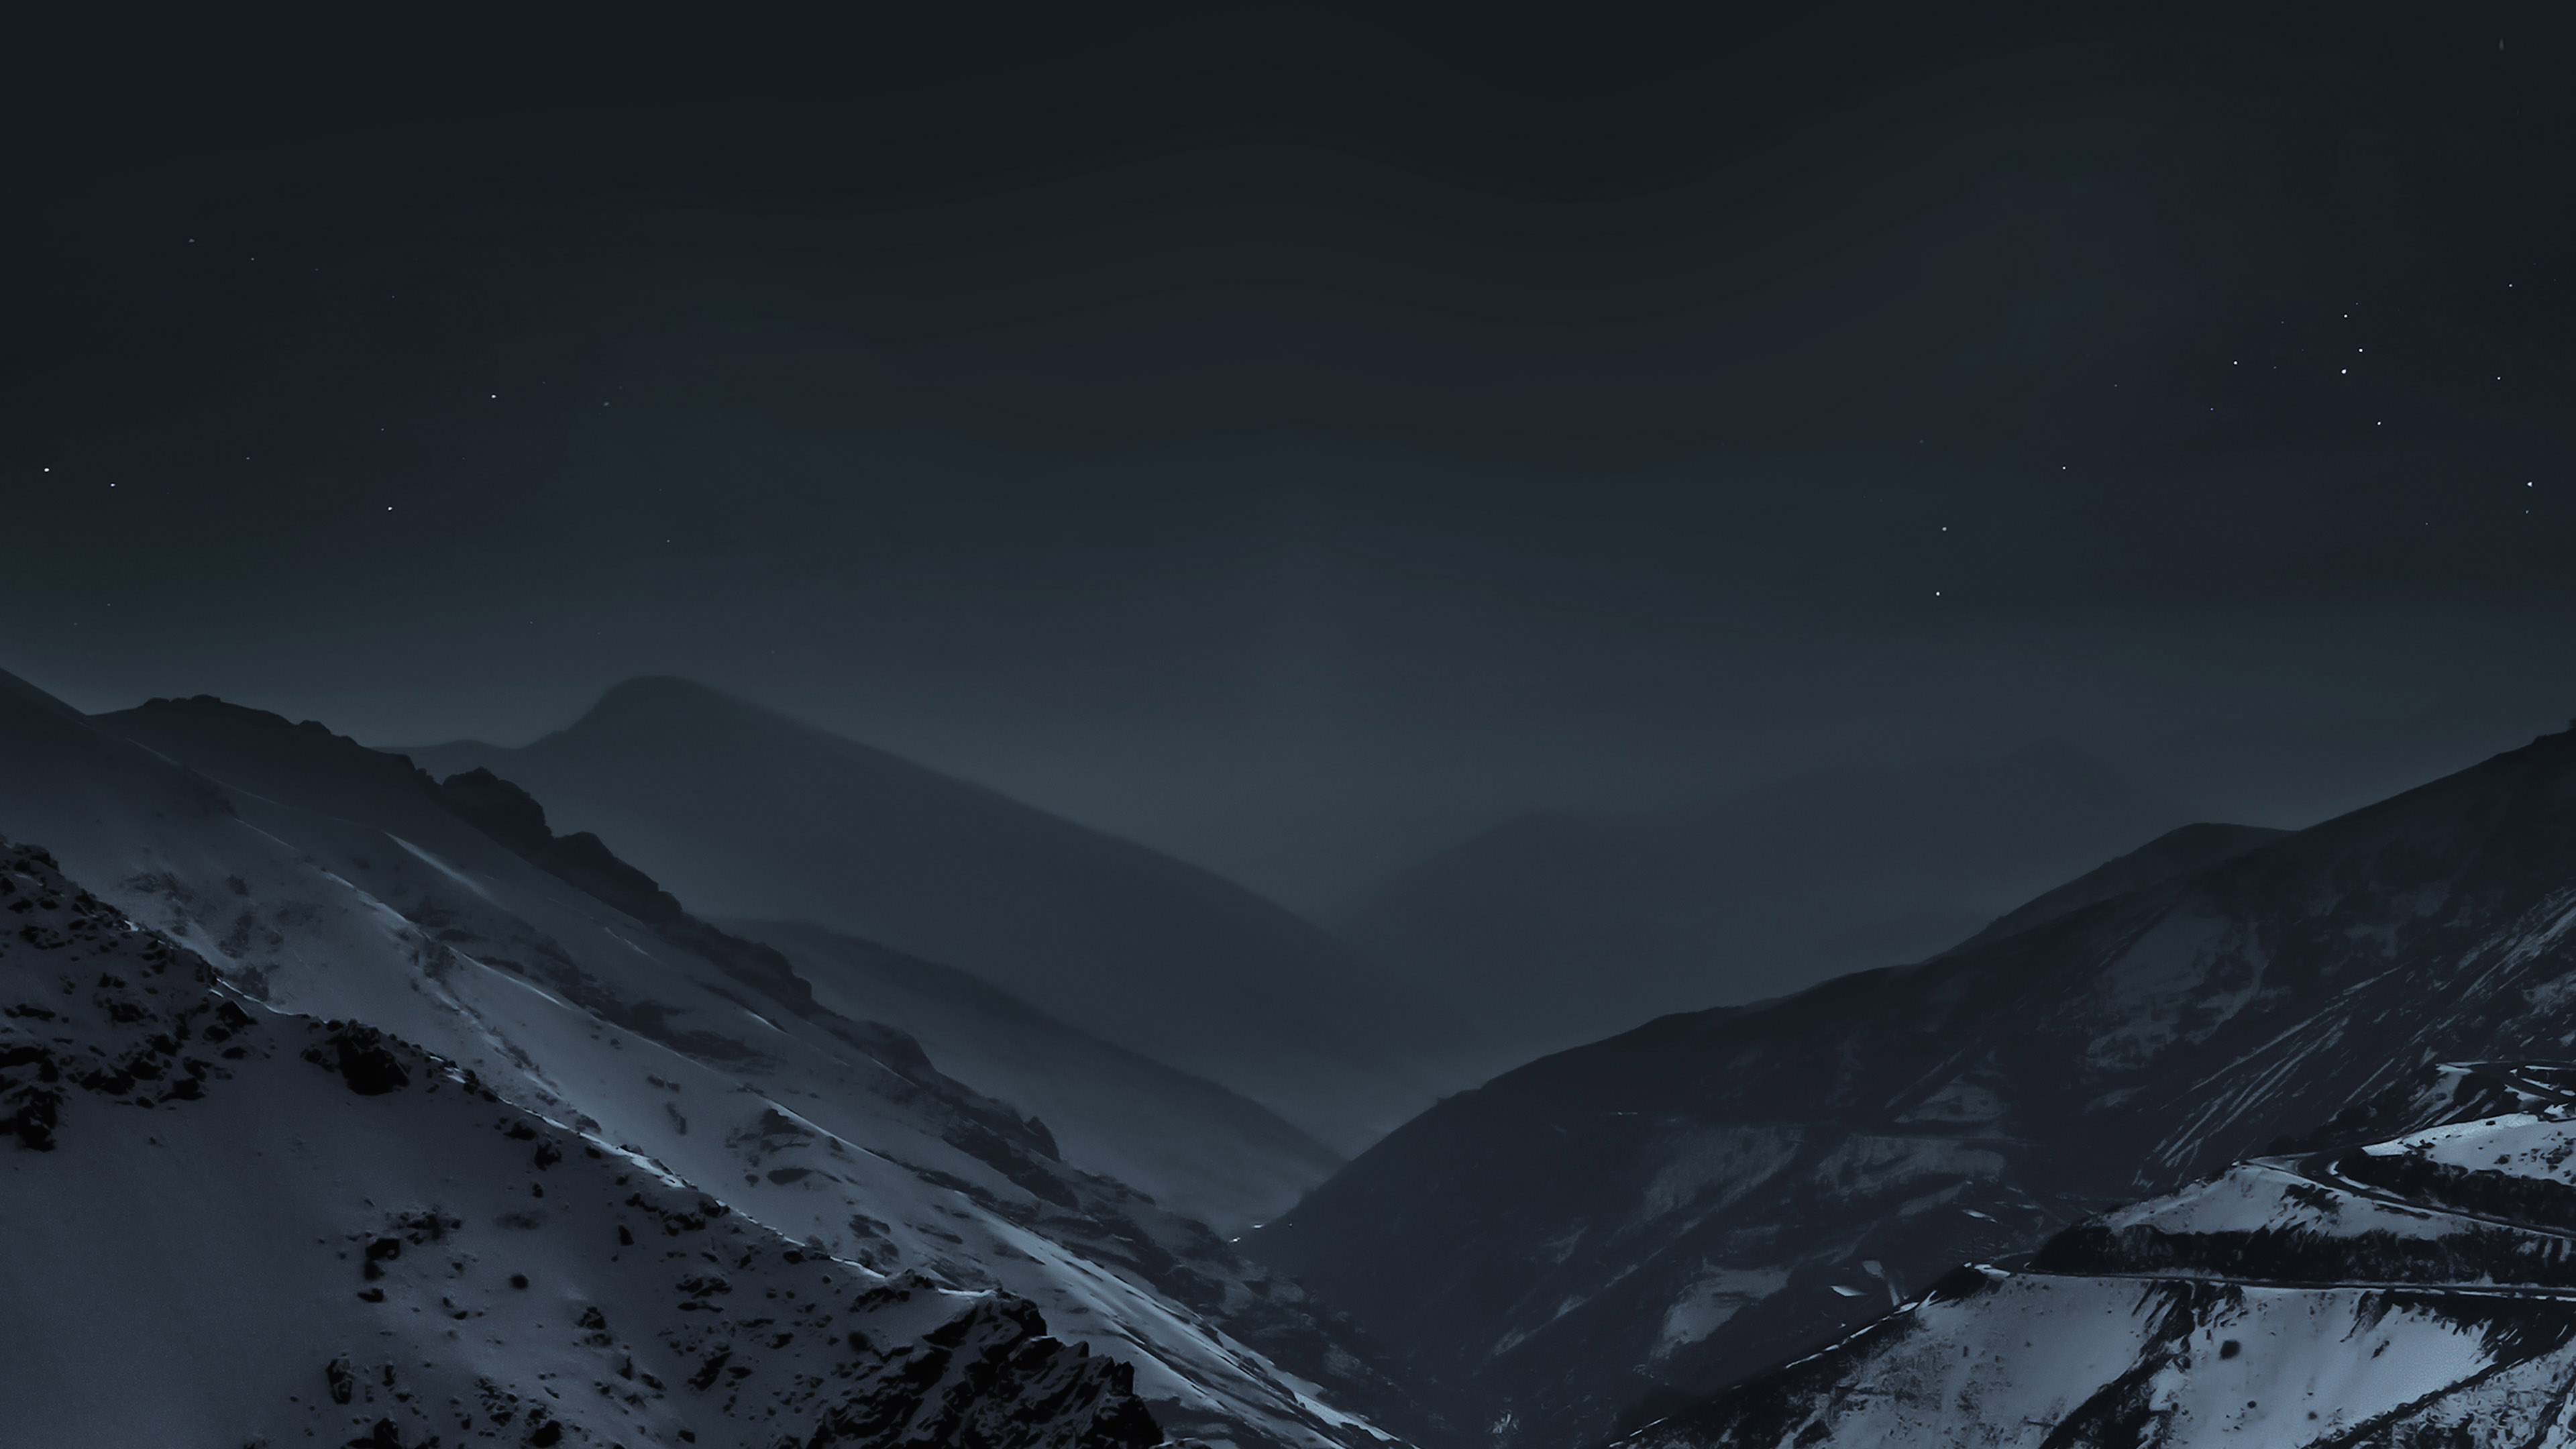 Most Inspiring Wallpaper Mountain Dark - papers  Pic_846048.jpg